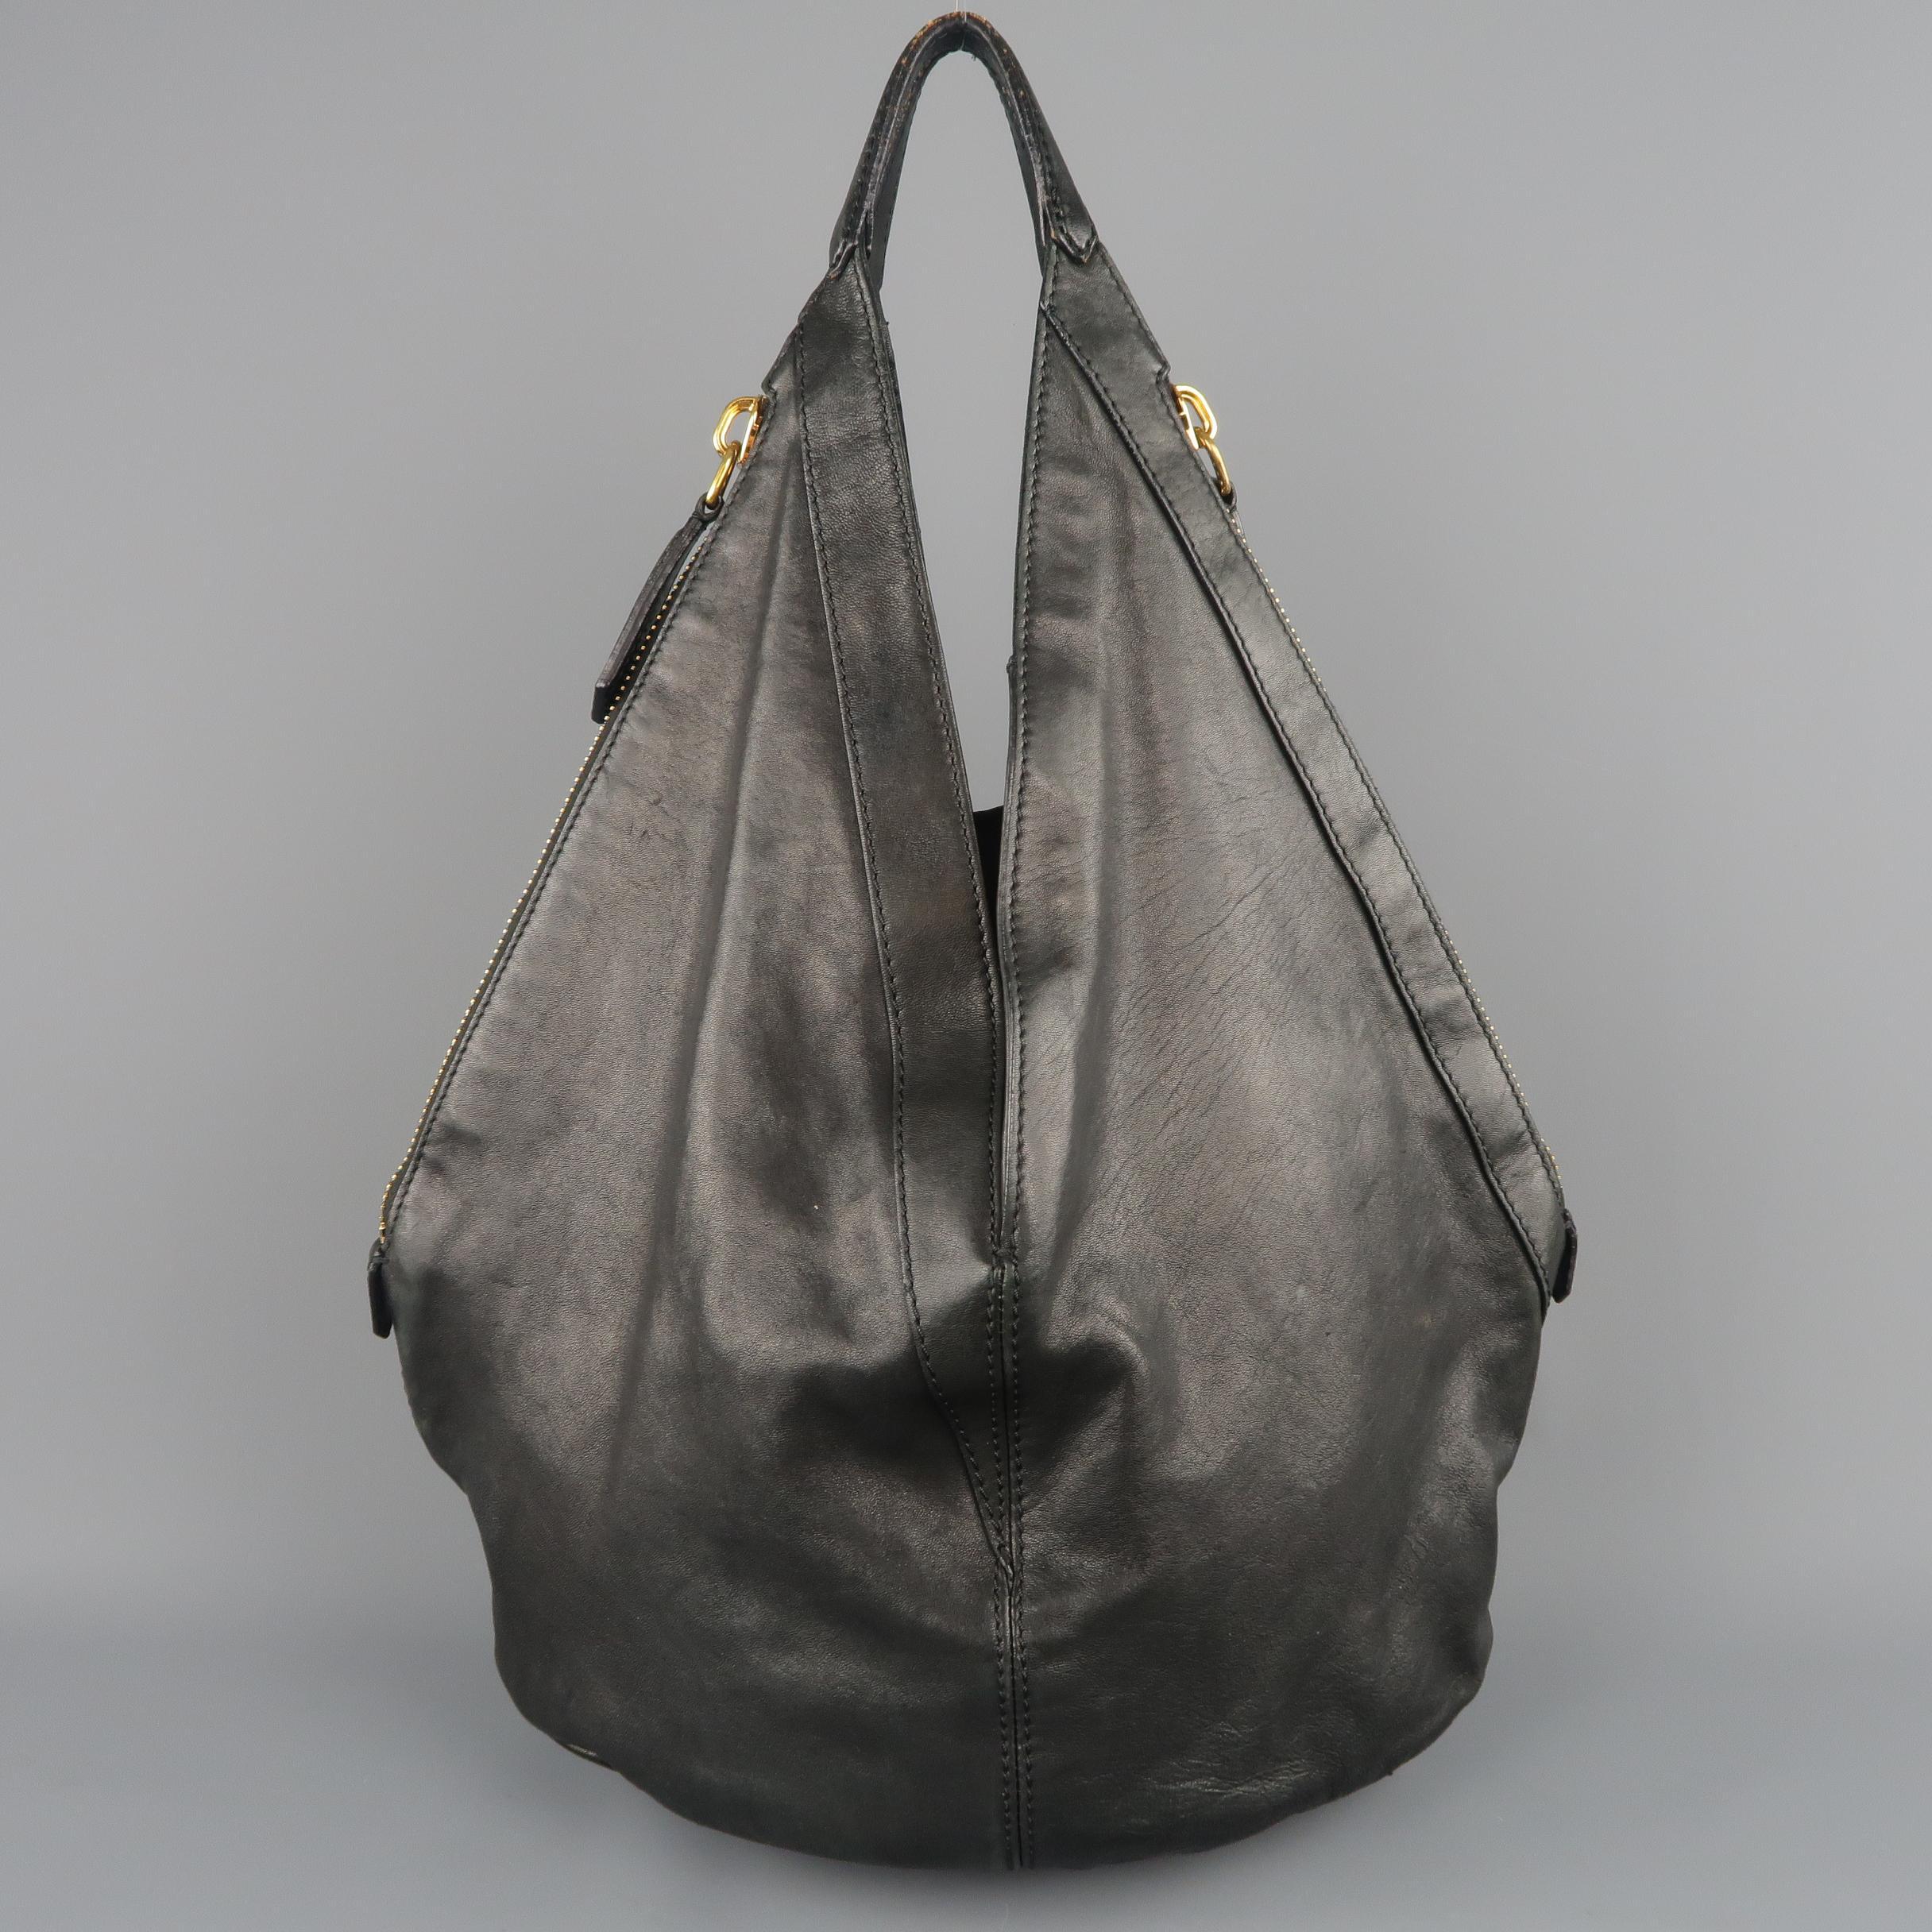 6cbf076a8d GIVENCHY Black Leather Gold Studded TINHAN Large Hobo Bag at 1stdibs